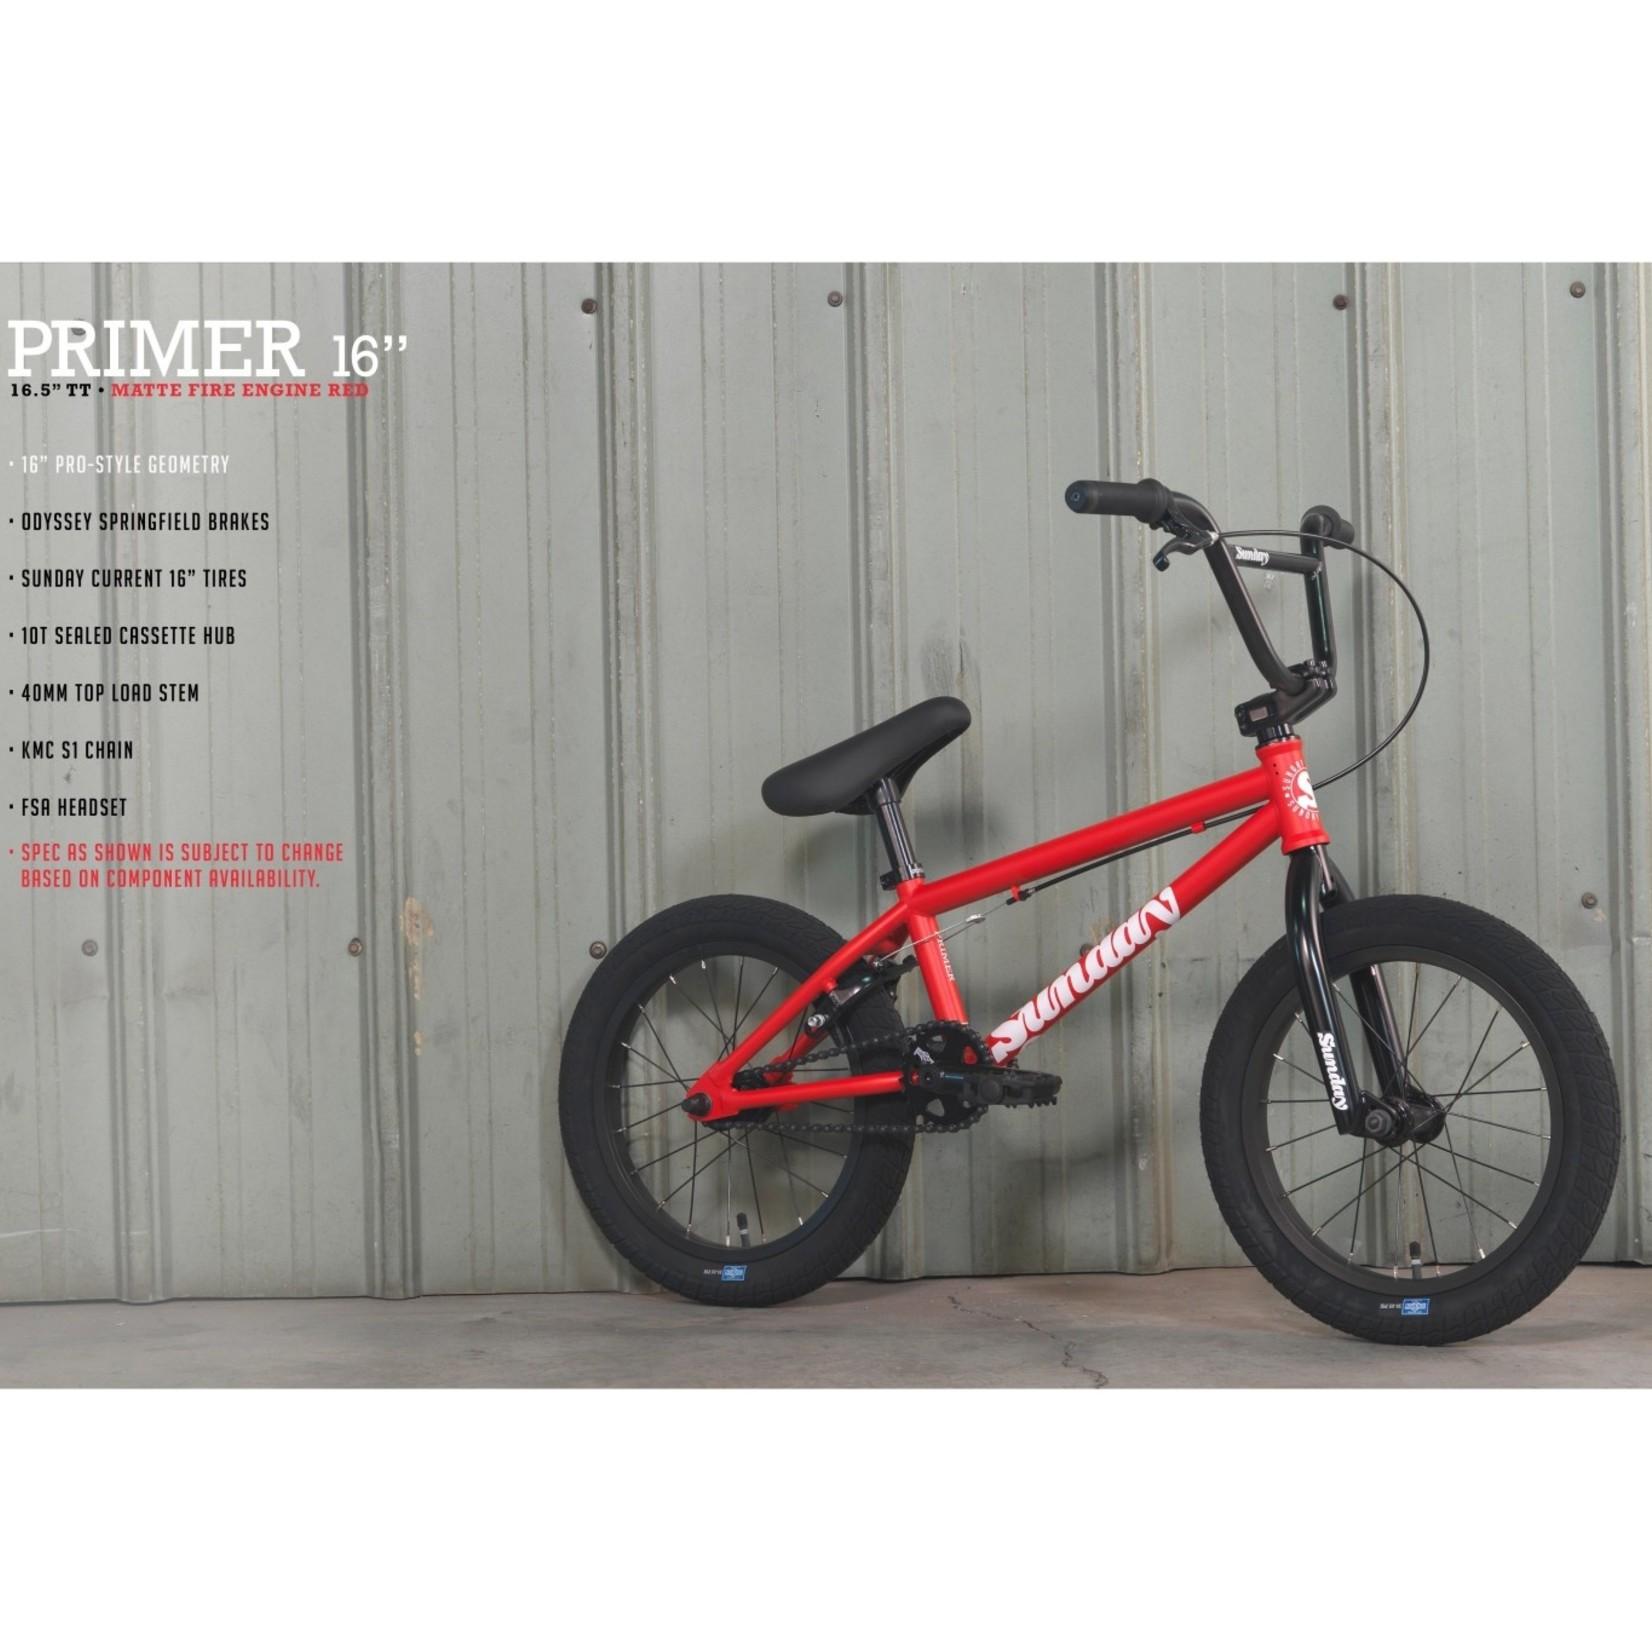 "SUNDAY PRIMER 16"" MATTE FIRE ENGINE RED 2022"